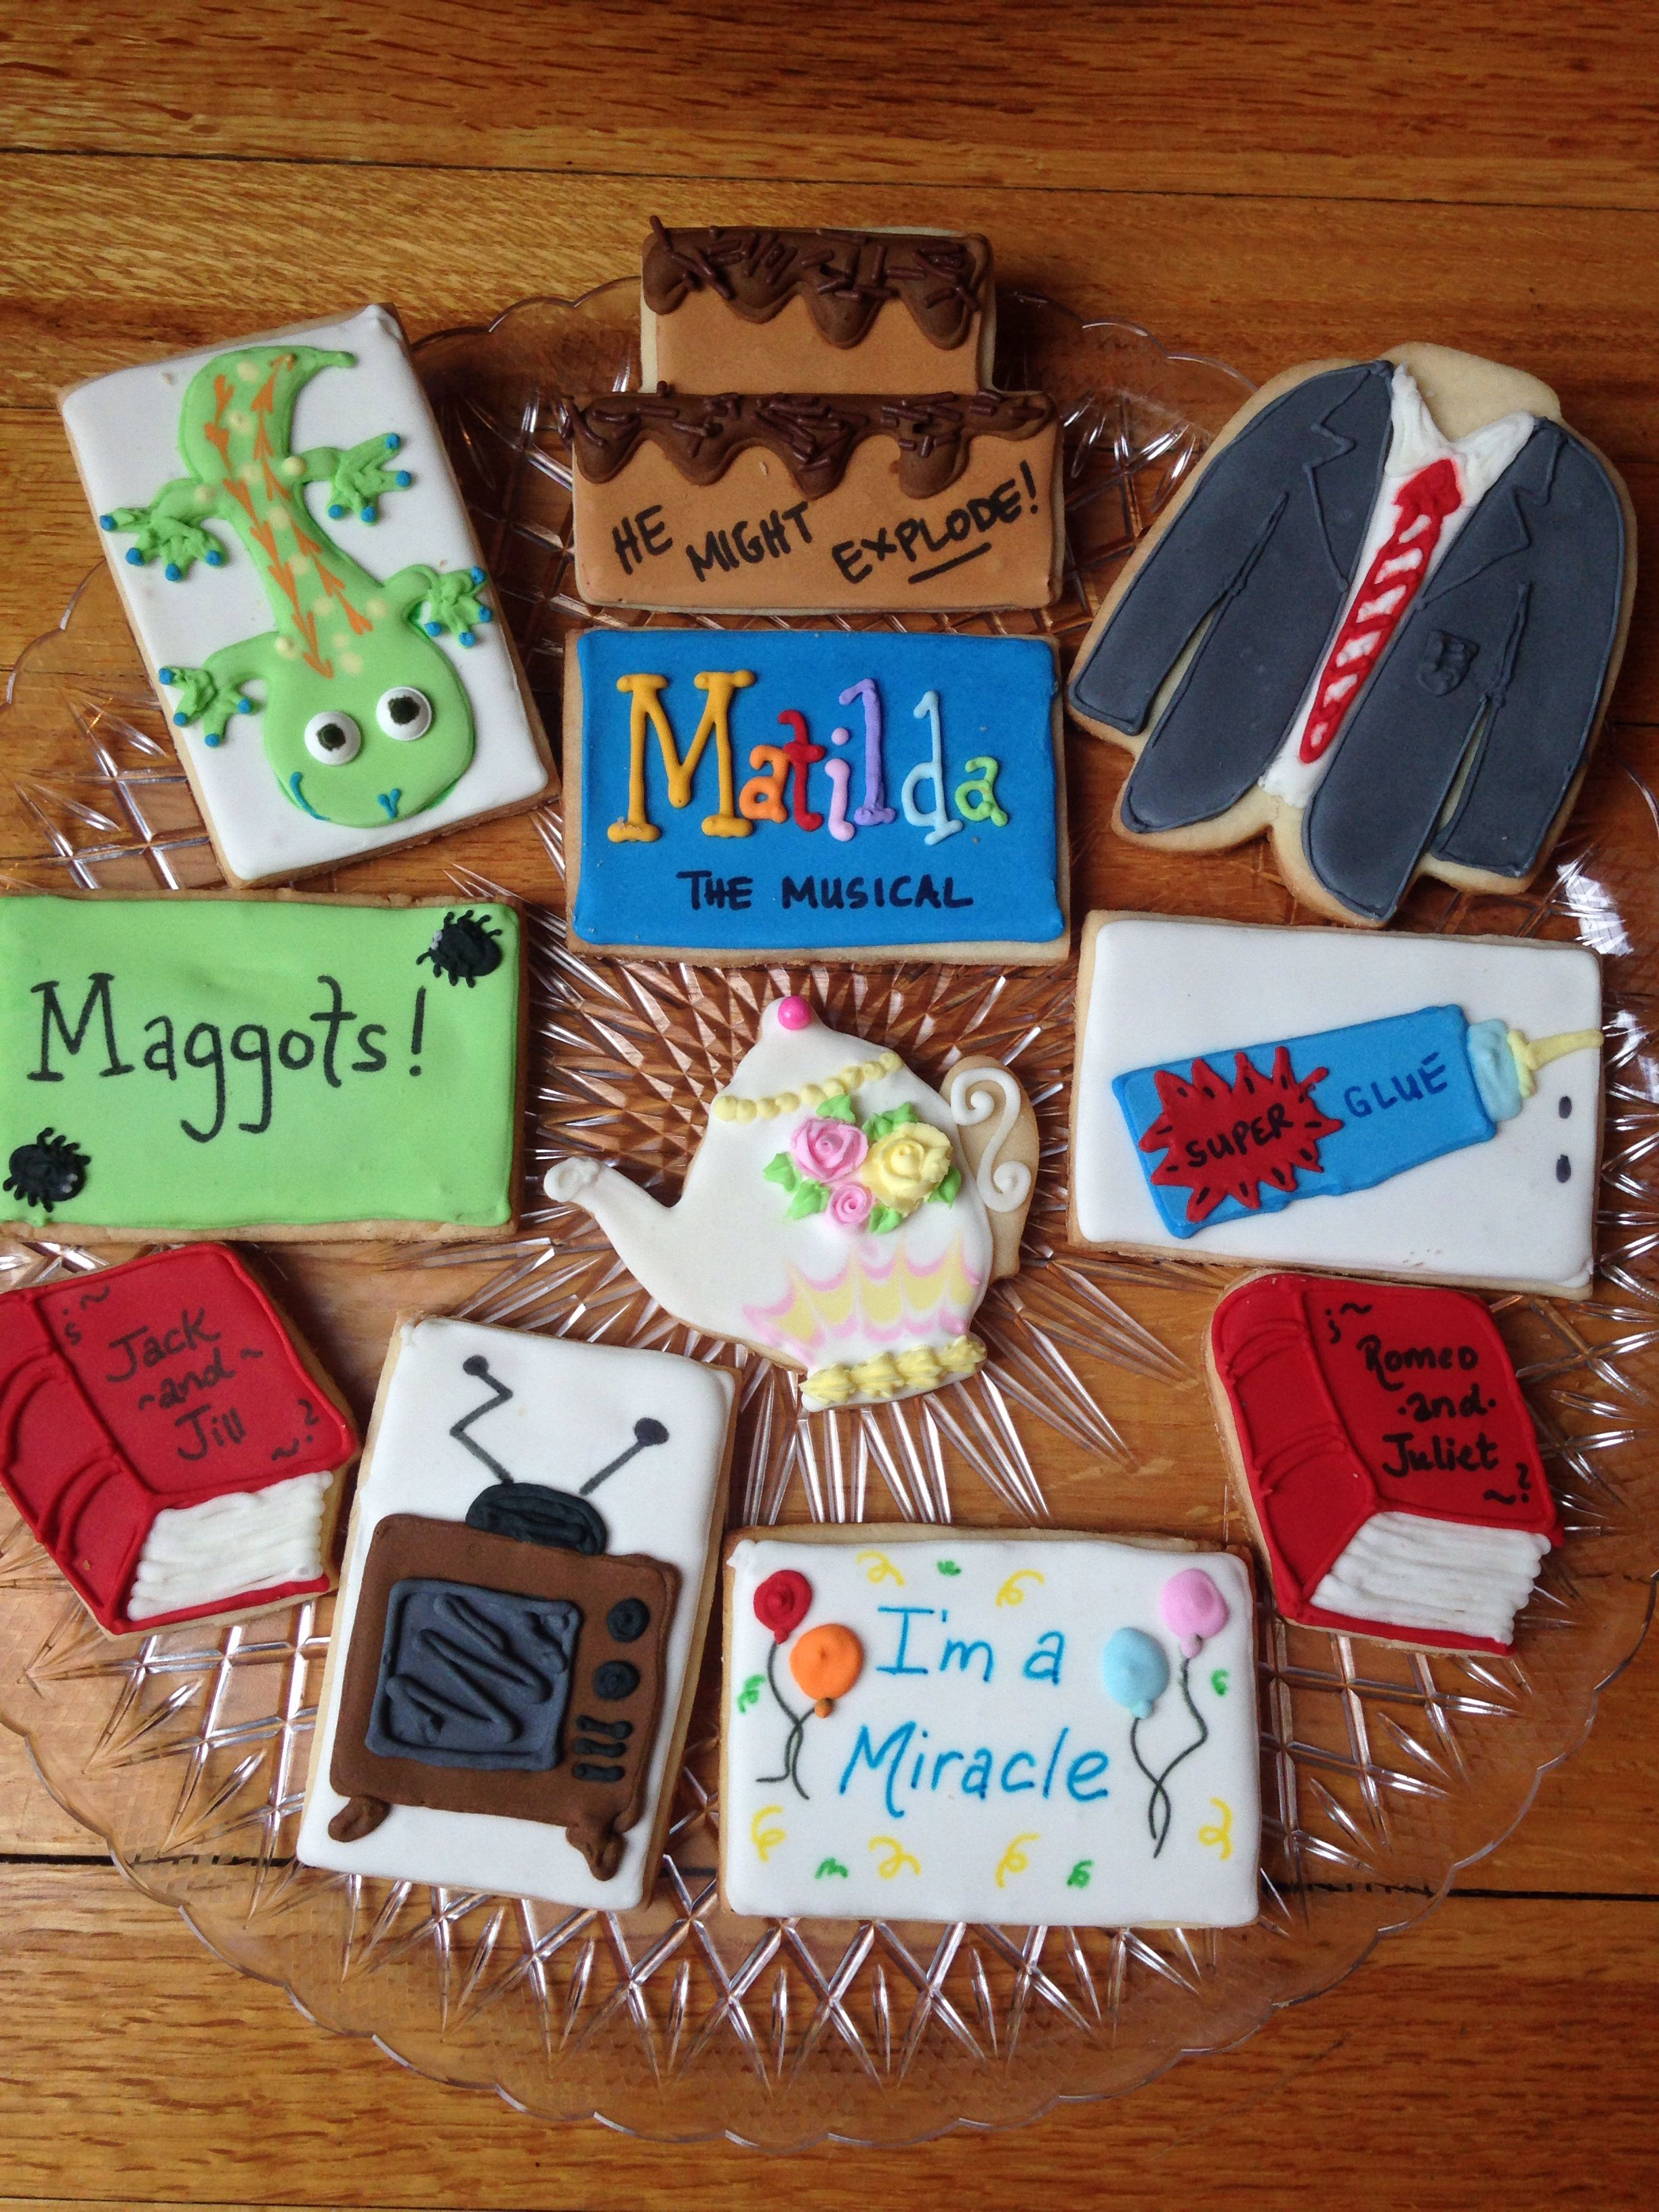 Kelly S Matilda The Musical Cookies Matilda Matilda Cake Food